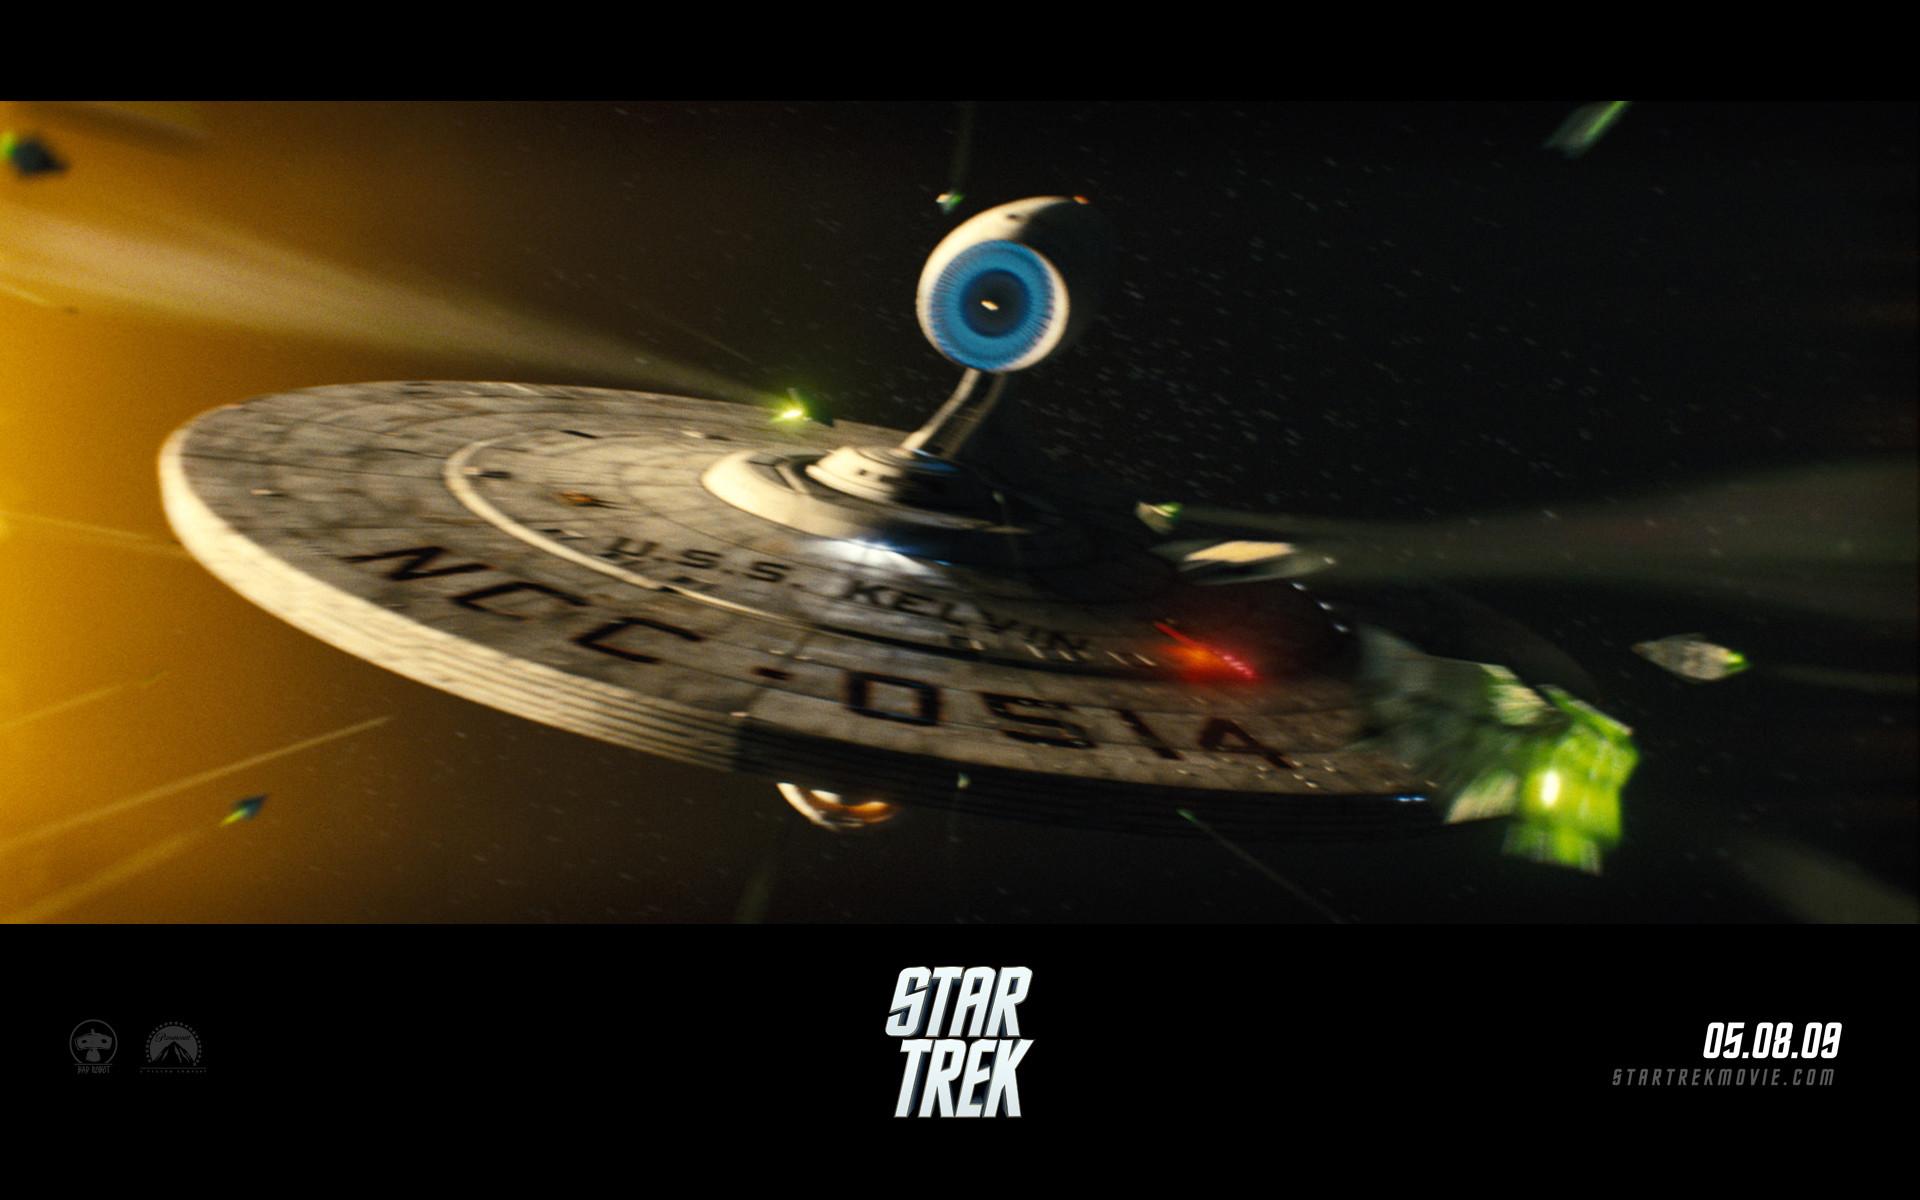 New Star Trek Wallpaper HD   ImageBank.biz